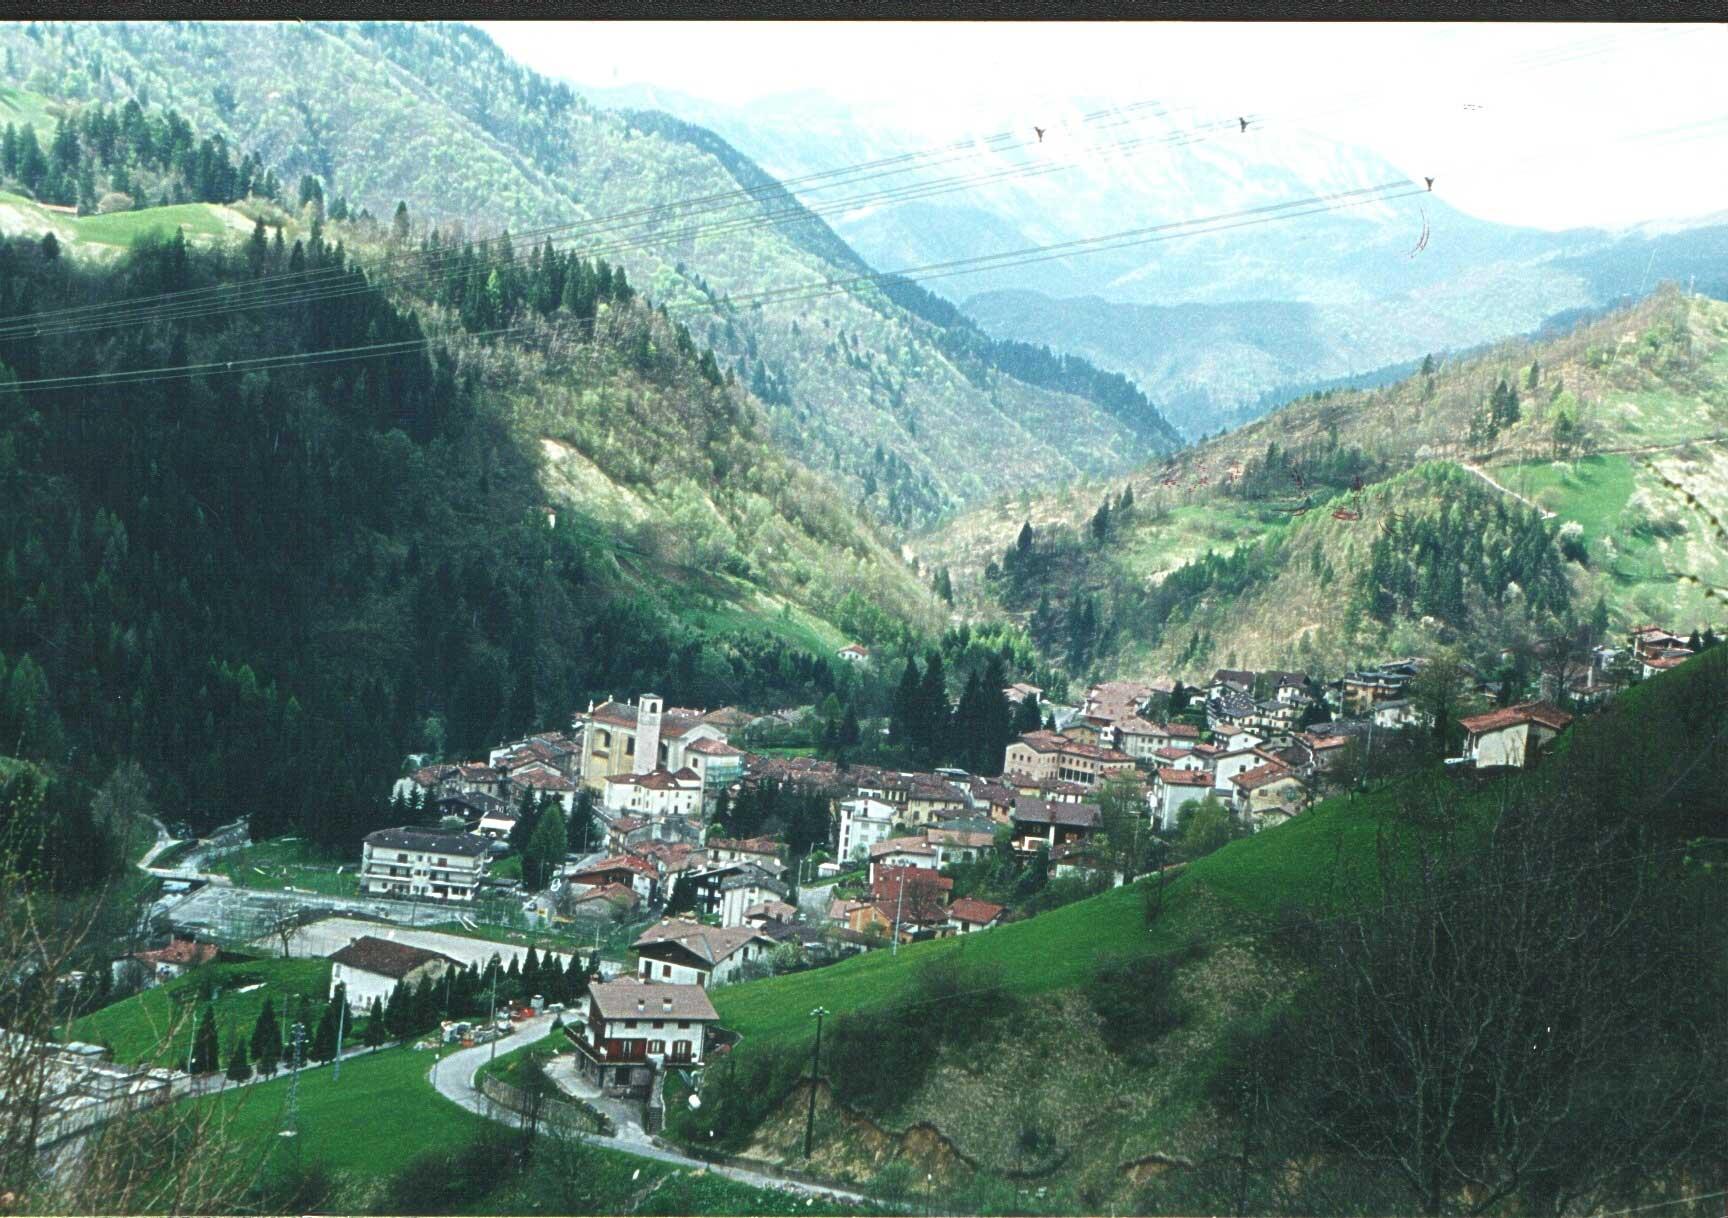 Casa per gruppi in Val Trompia(BS) Rif. 894